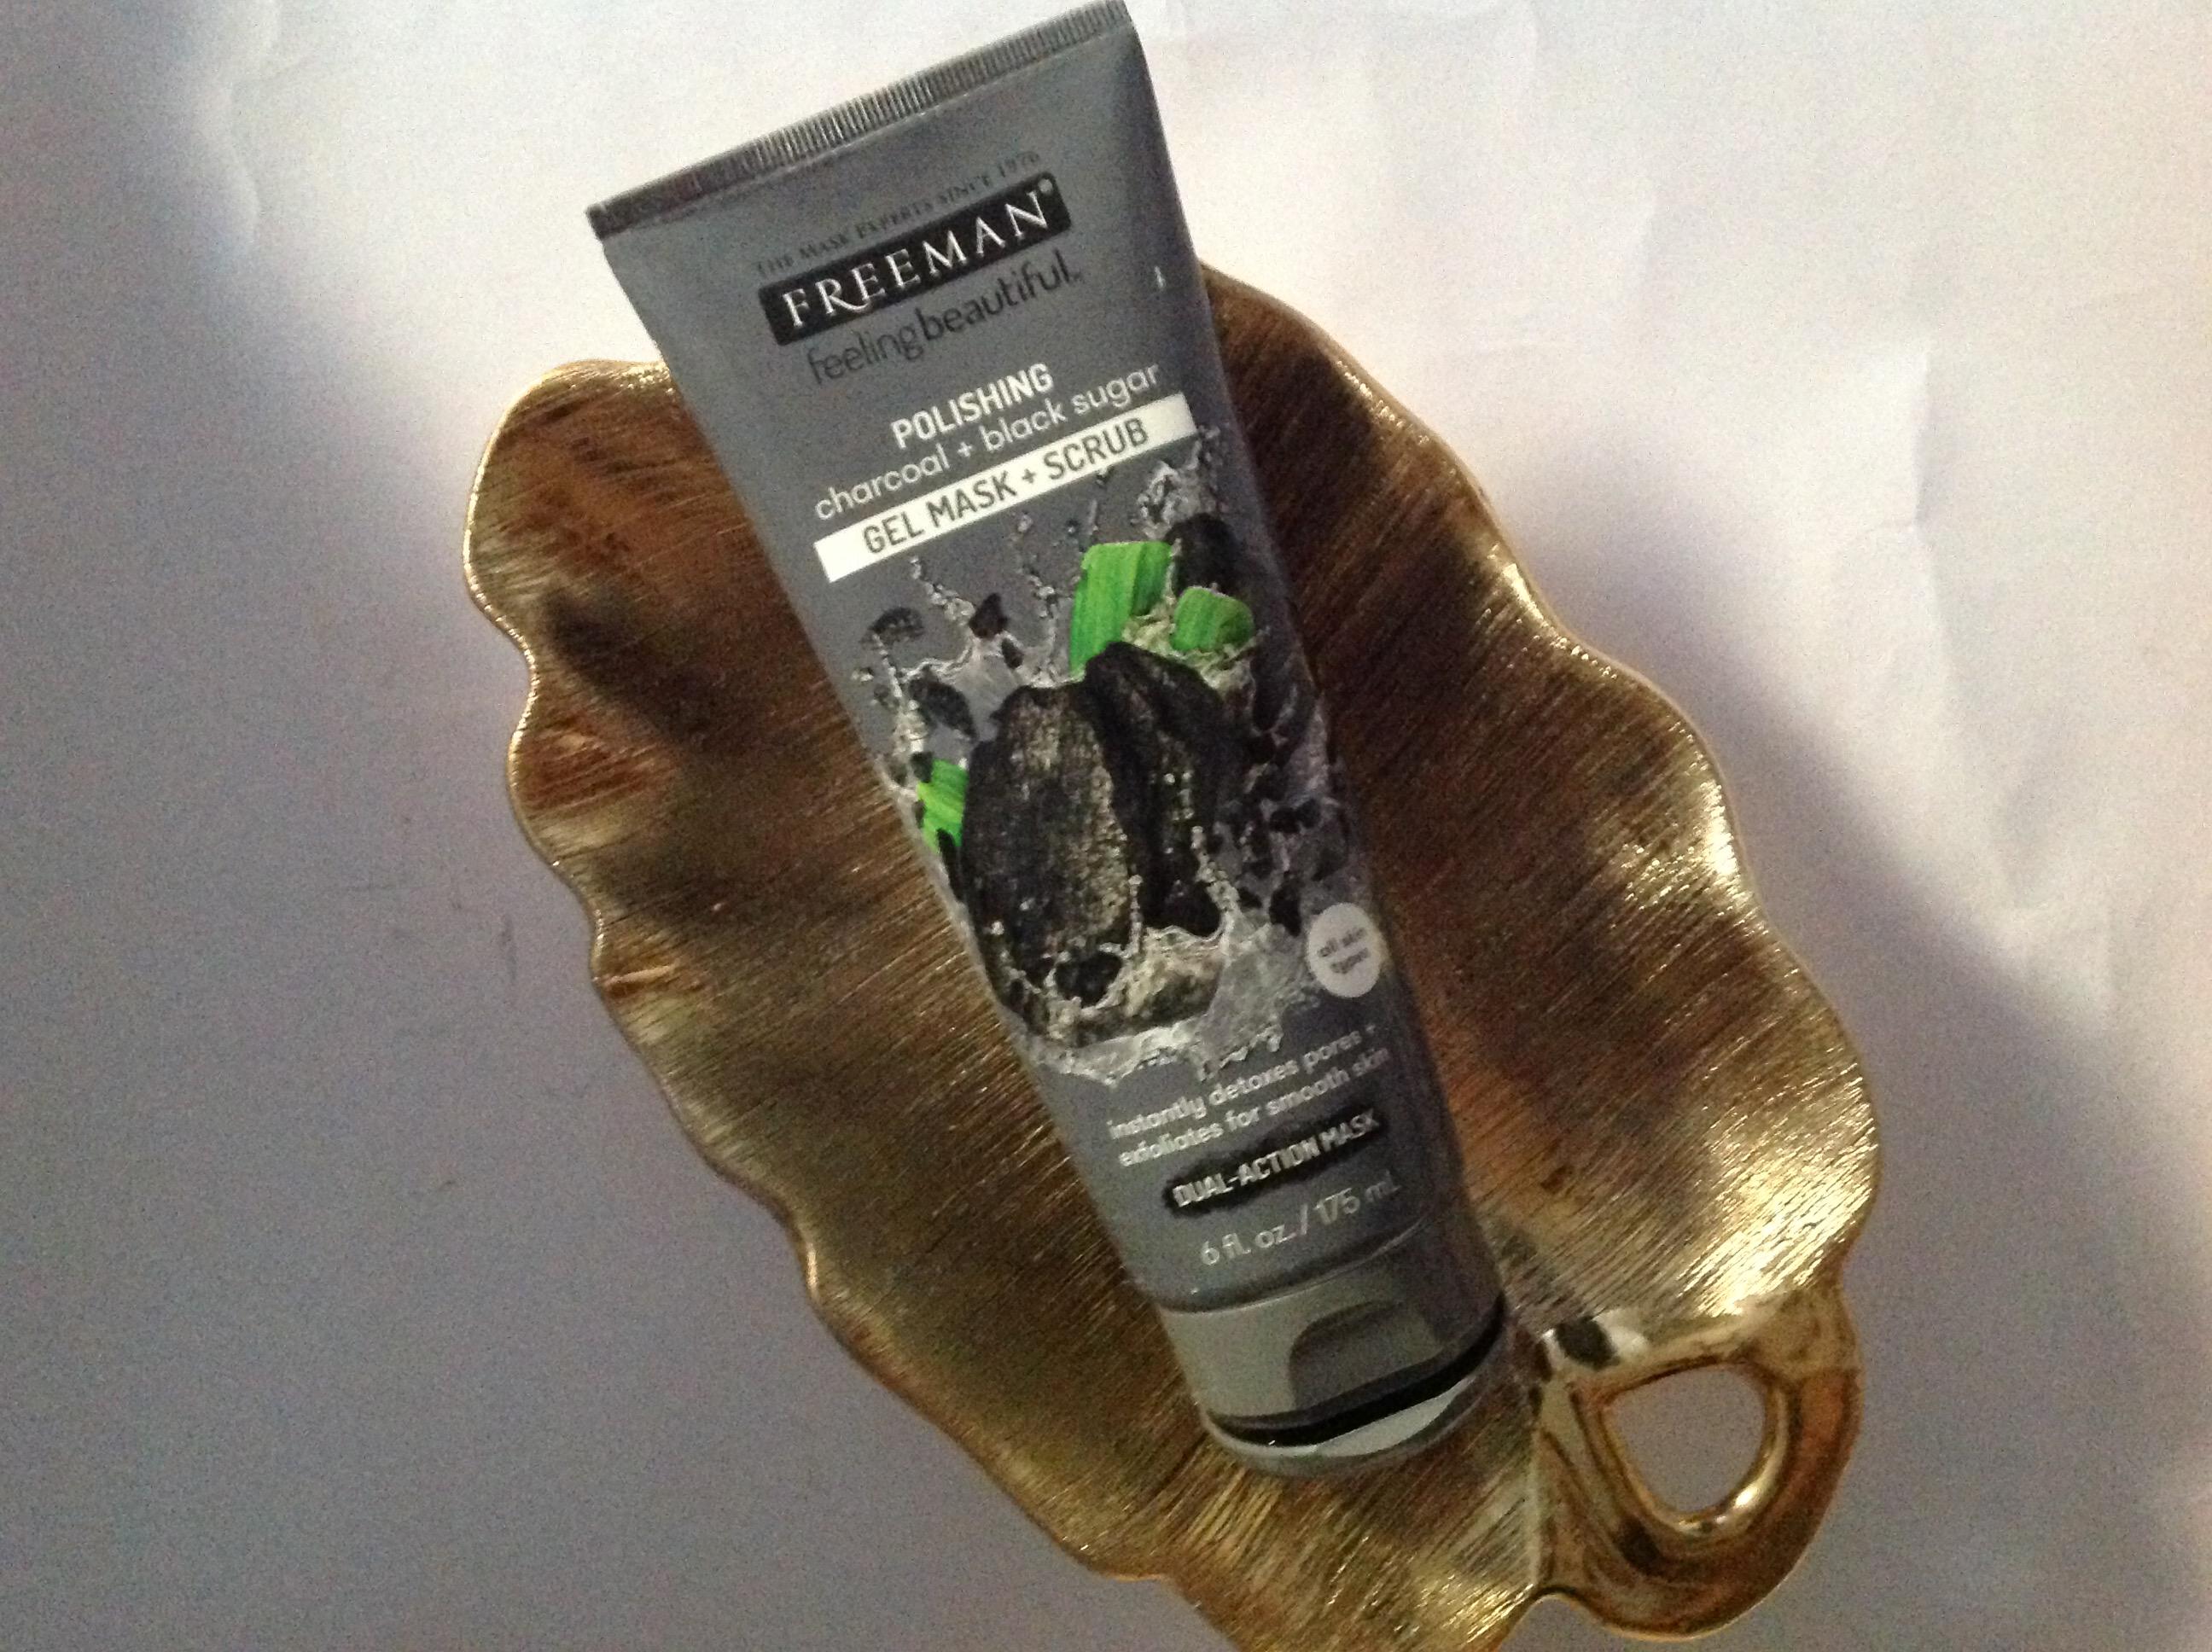 Photo of Freeman Beauty Feeling Beautiful™ Charcoal & Black Sugar Polishing Mask uploaded by Nneka A.